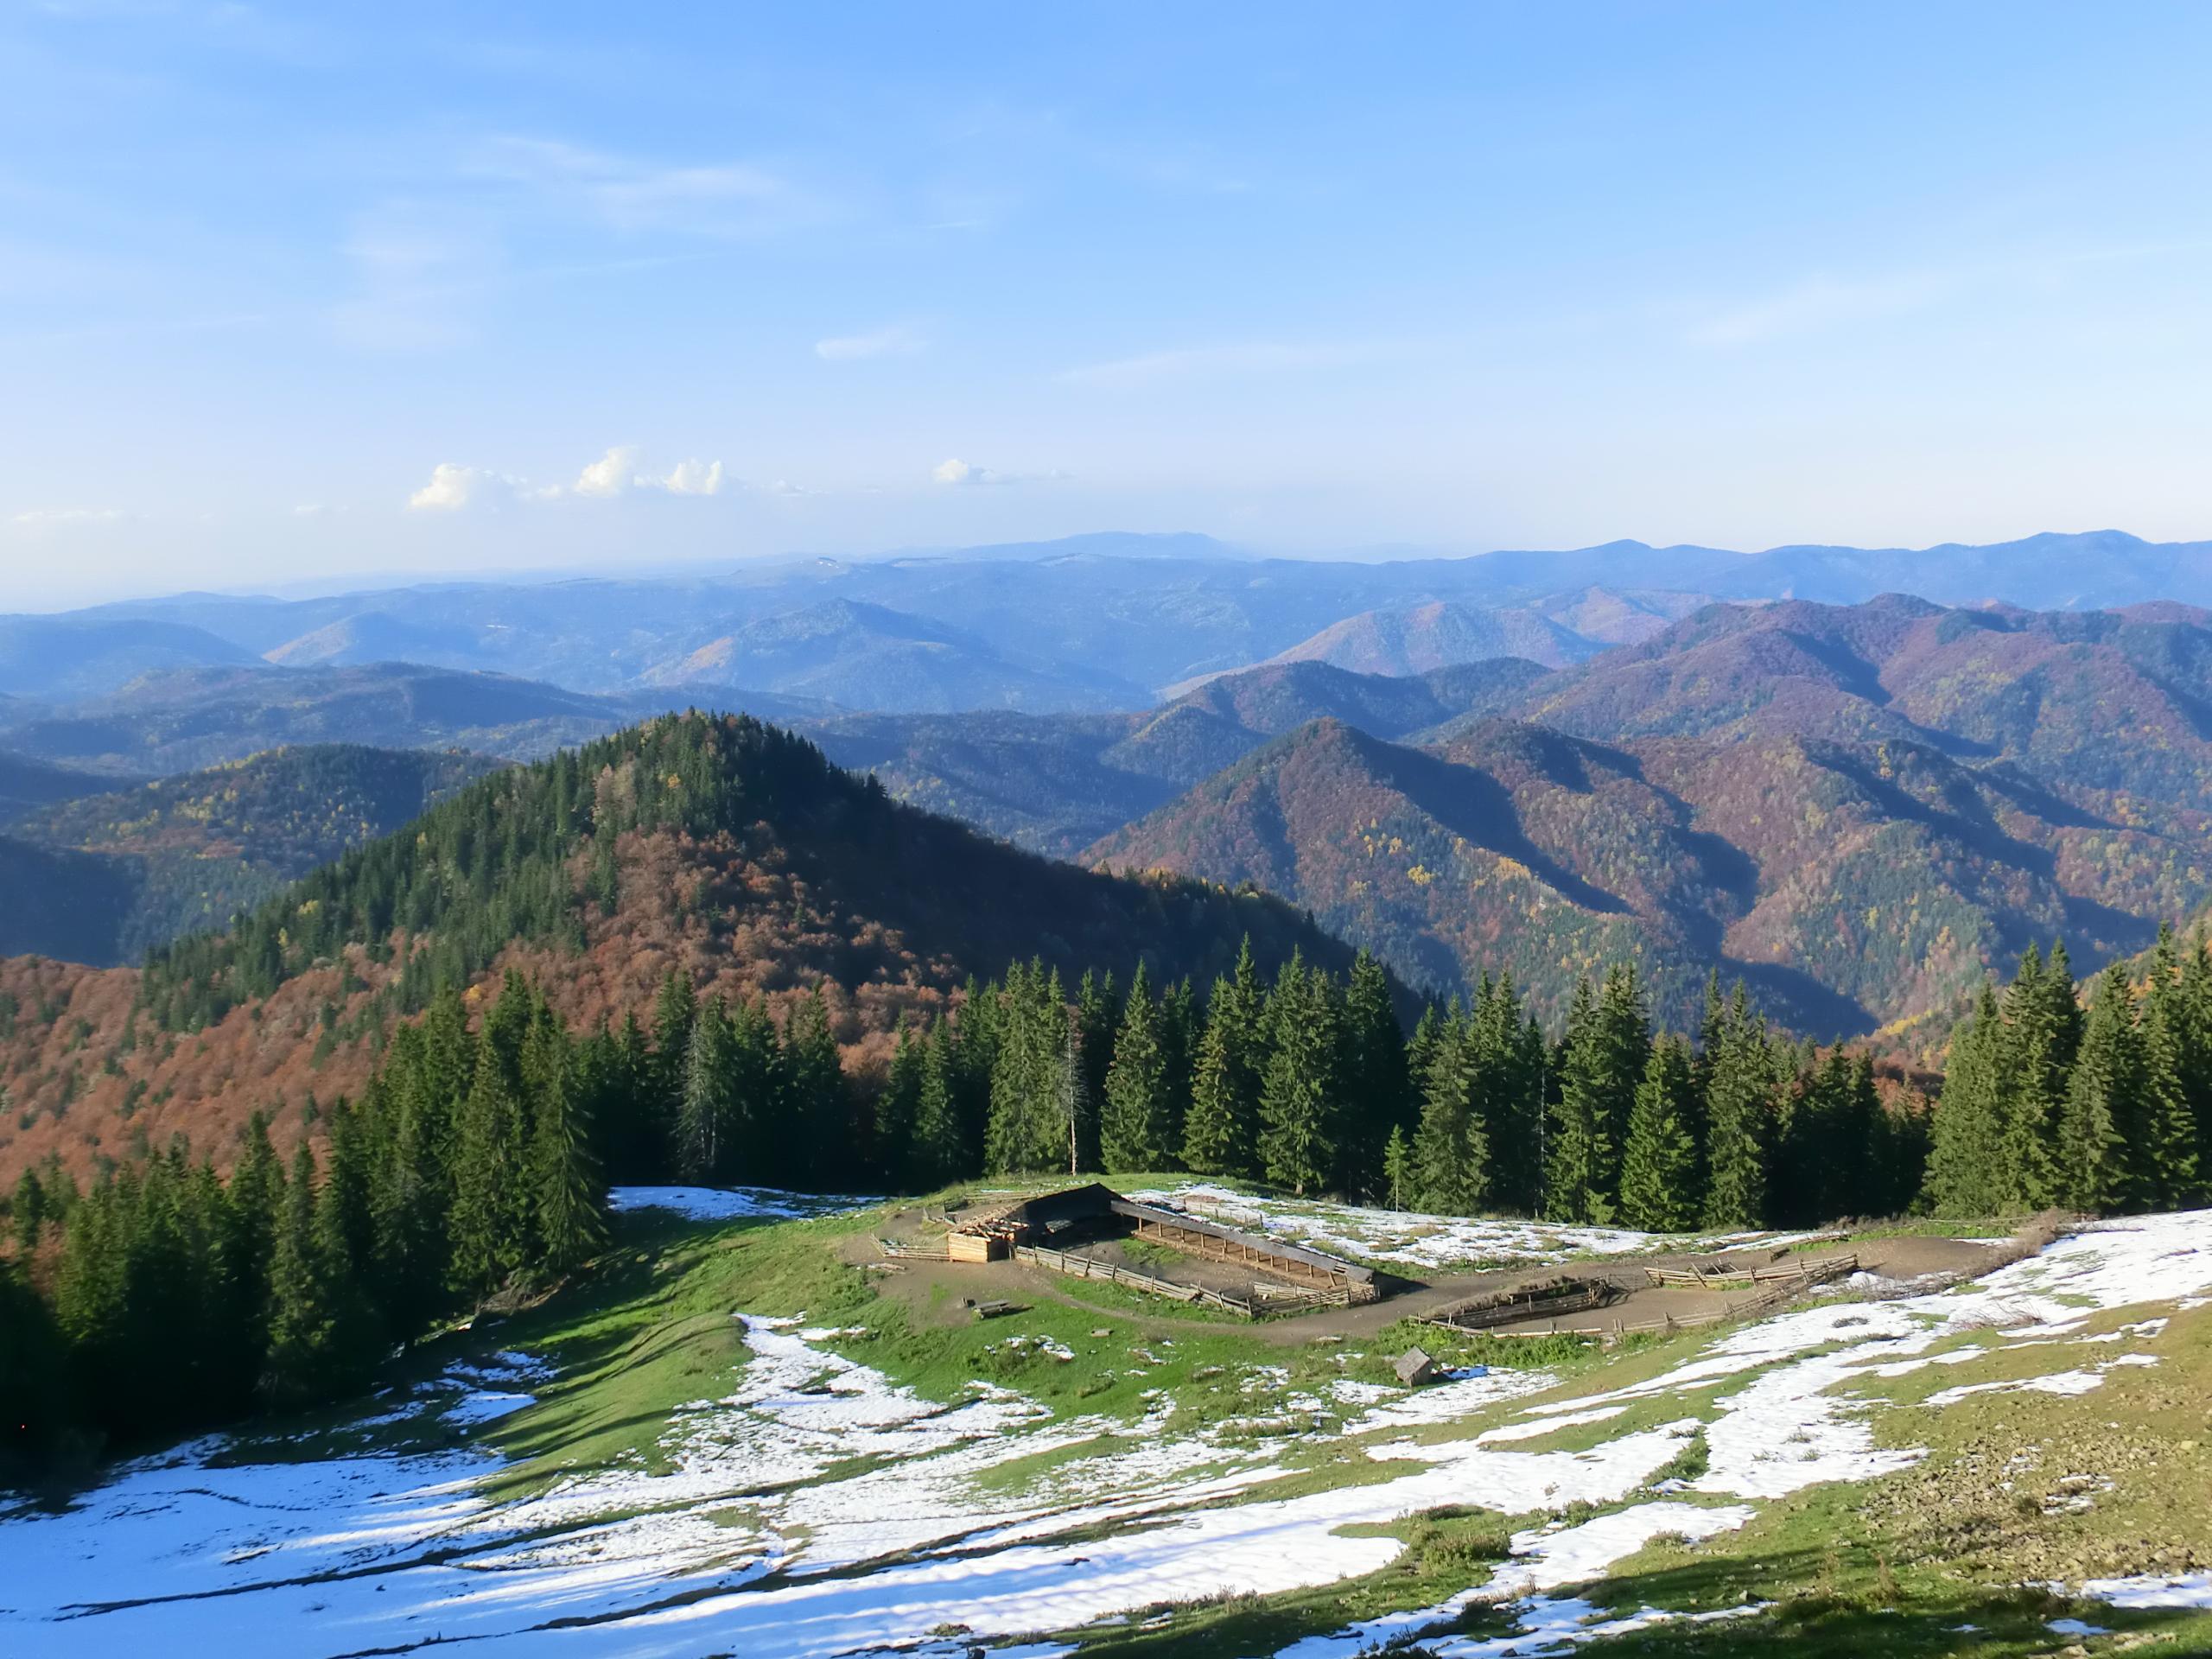 103 - 12.10.2013 - Stâna Cristianul Mare - Muntele Coza